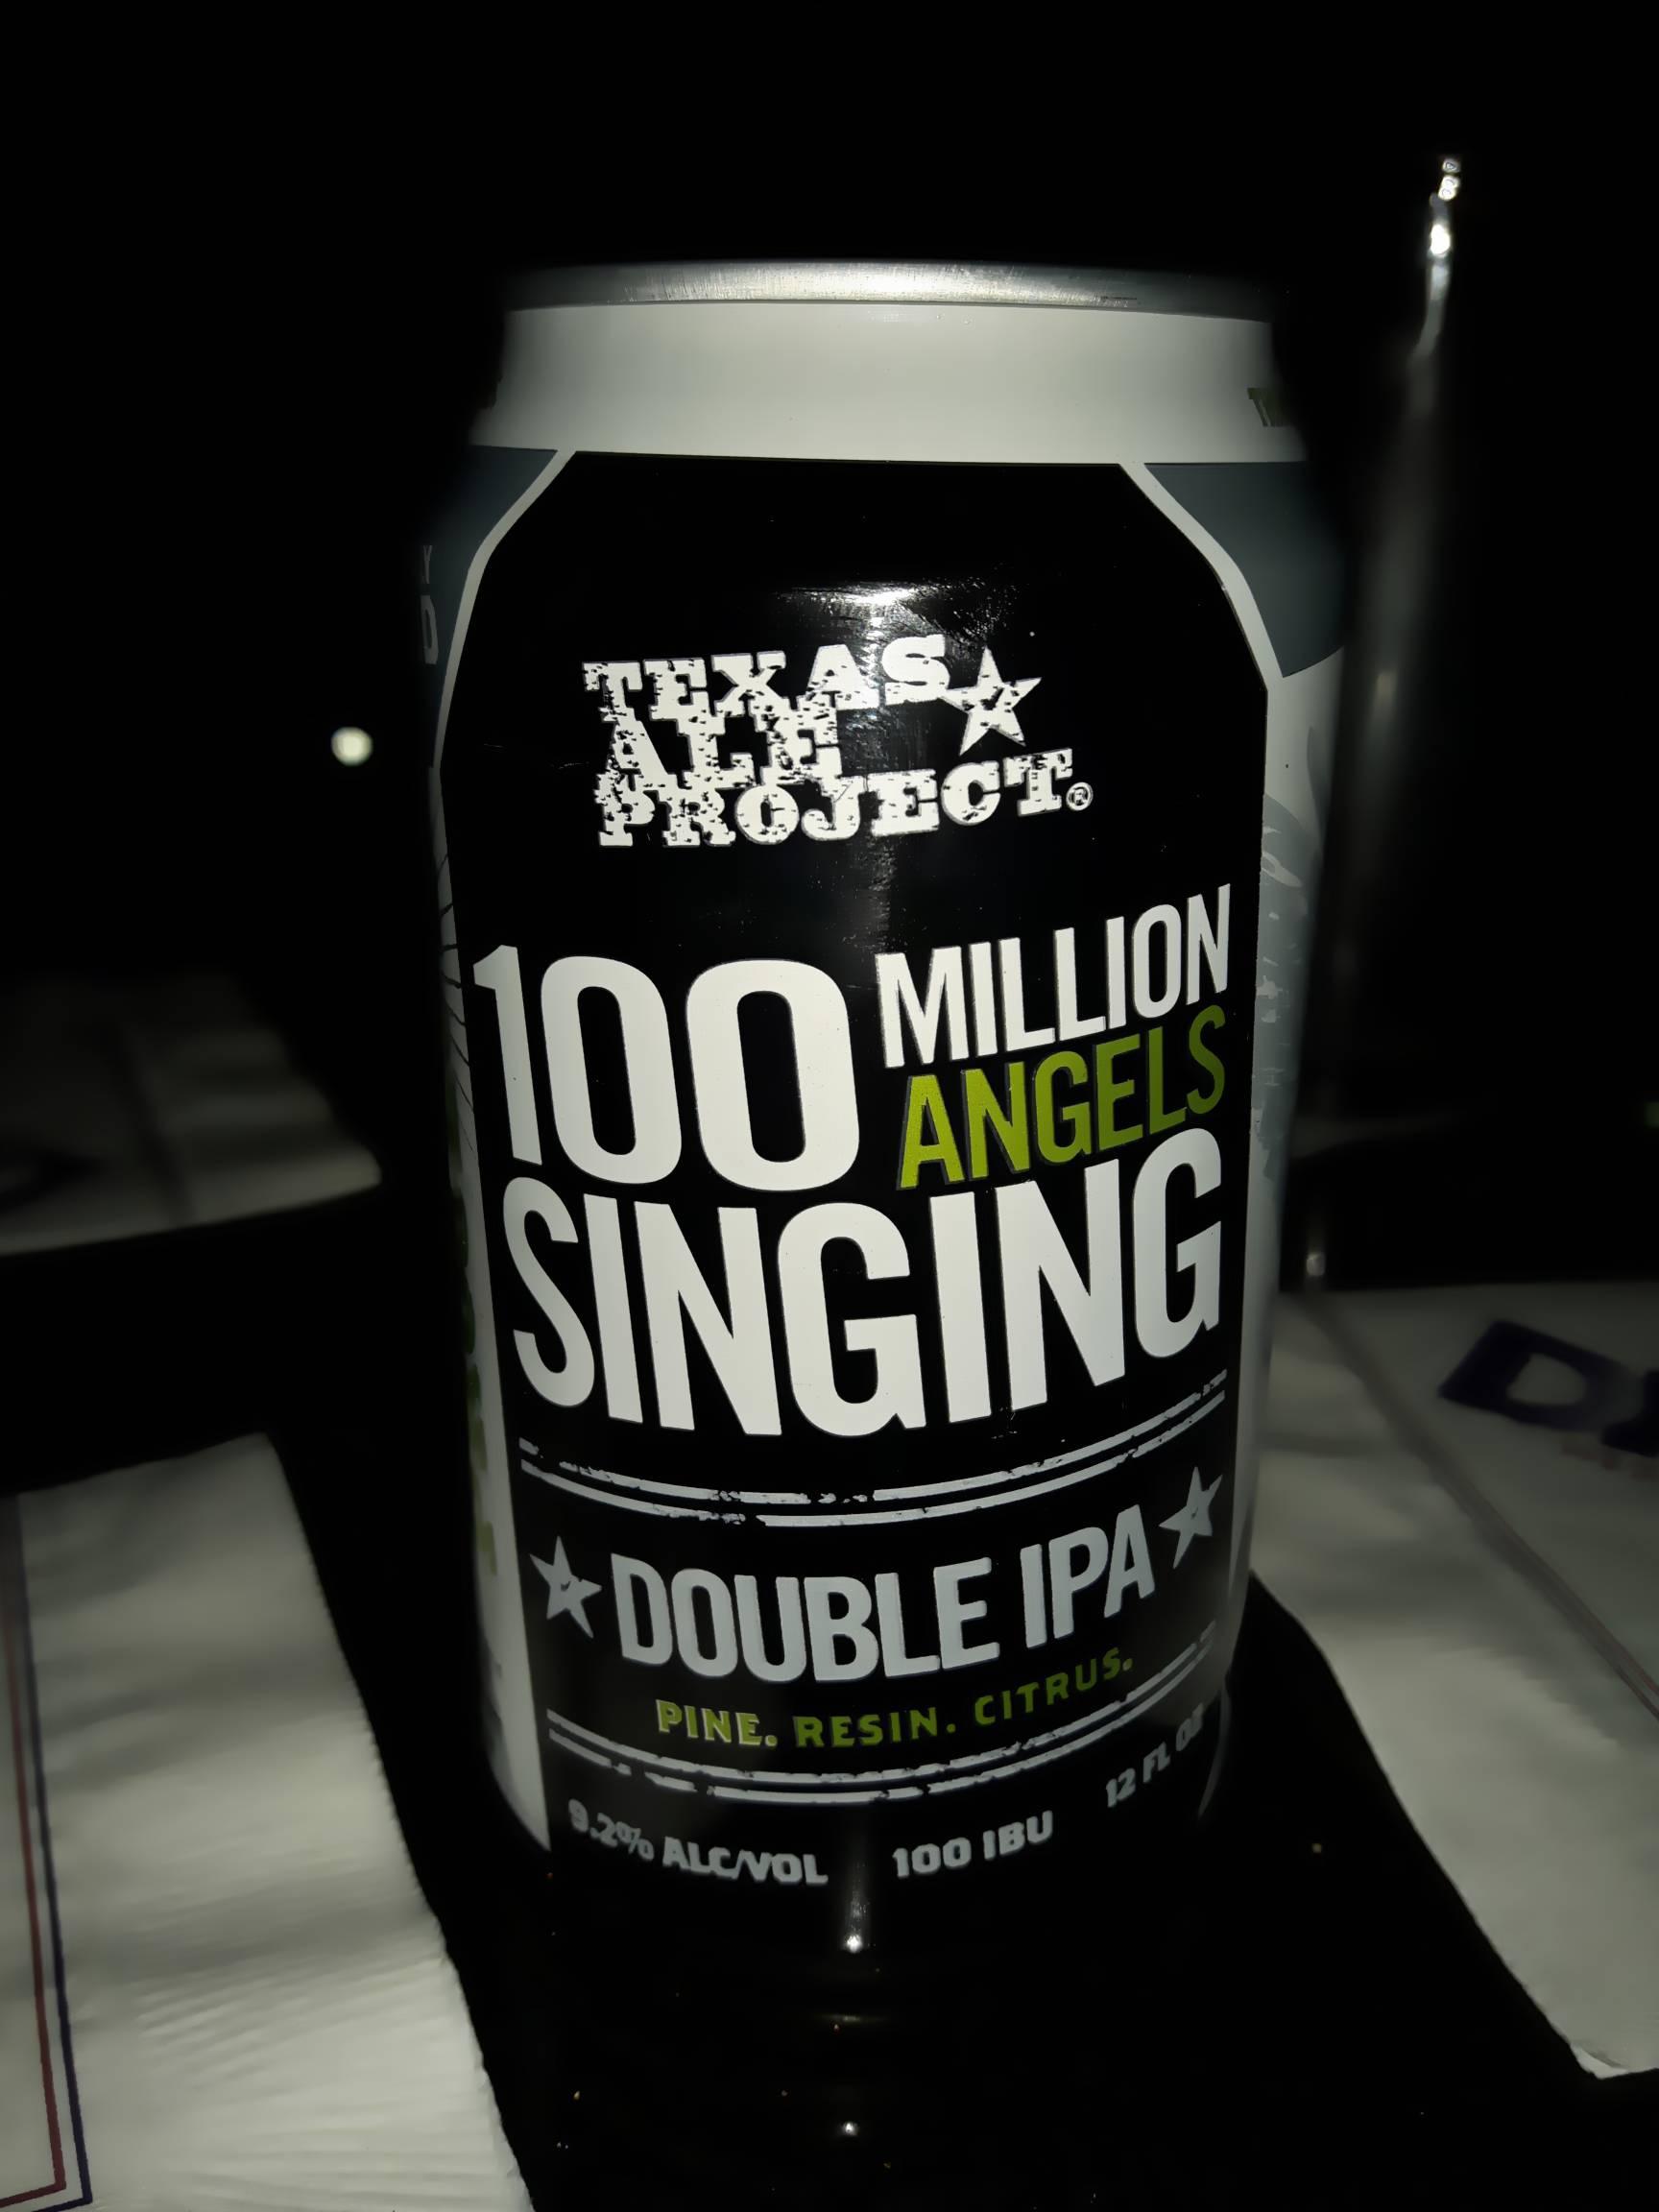 100MillionAngelsSinging_DoubleIPA_Texas